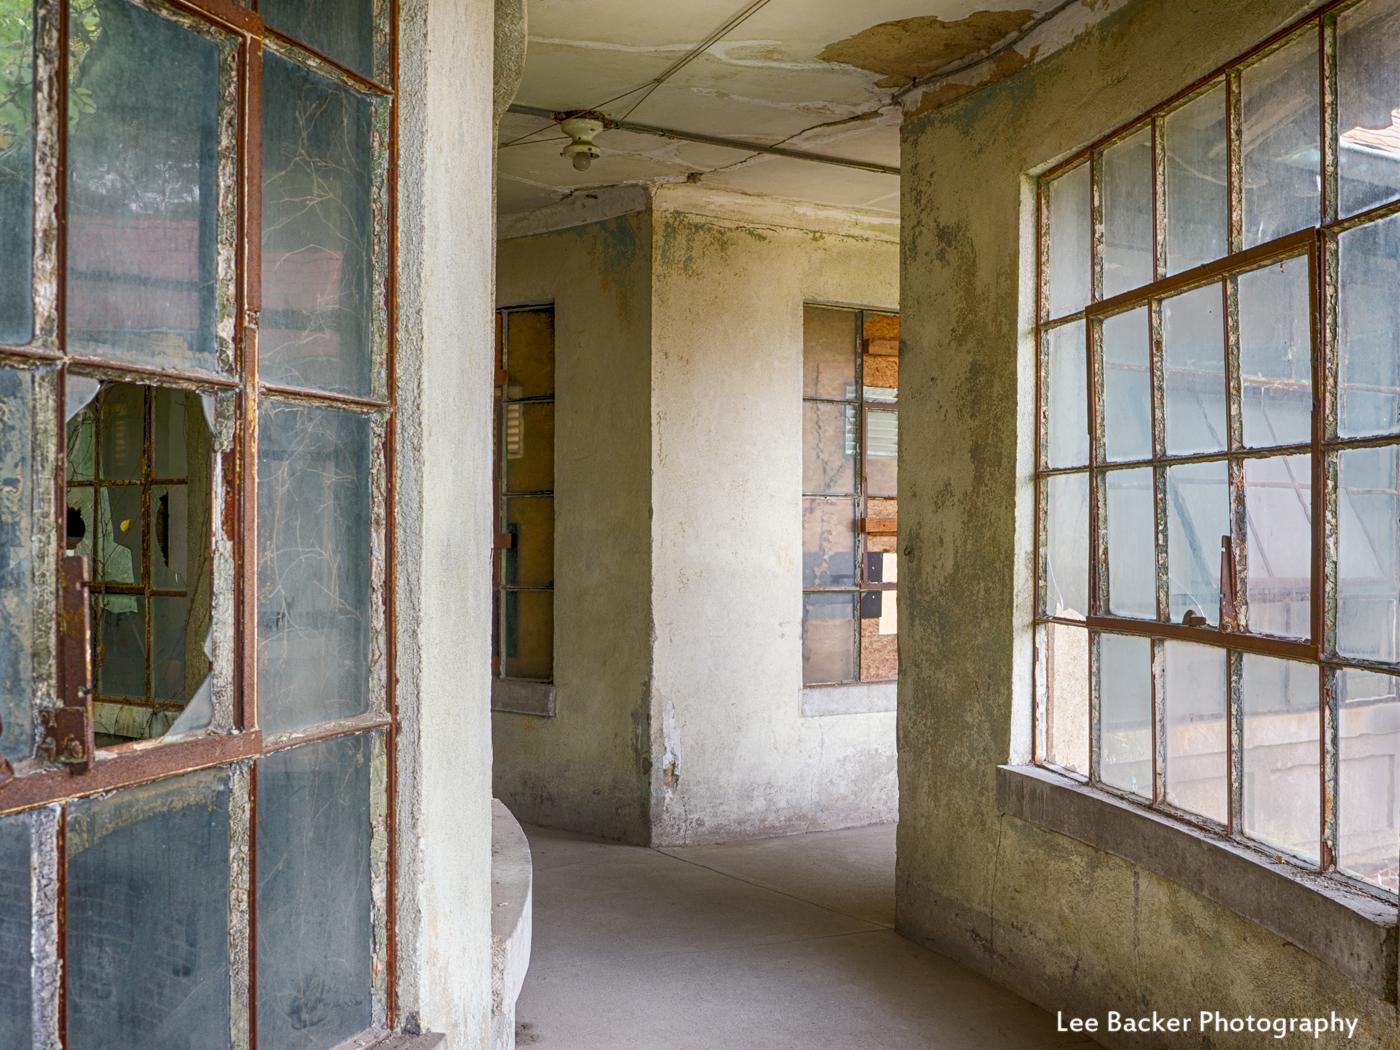 Corridor to Isolation Ward